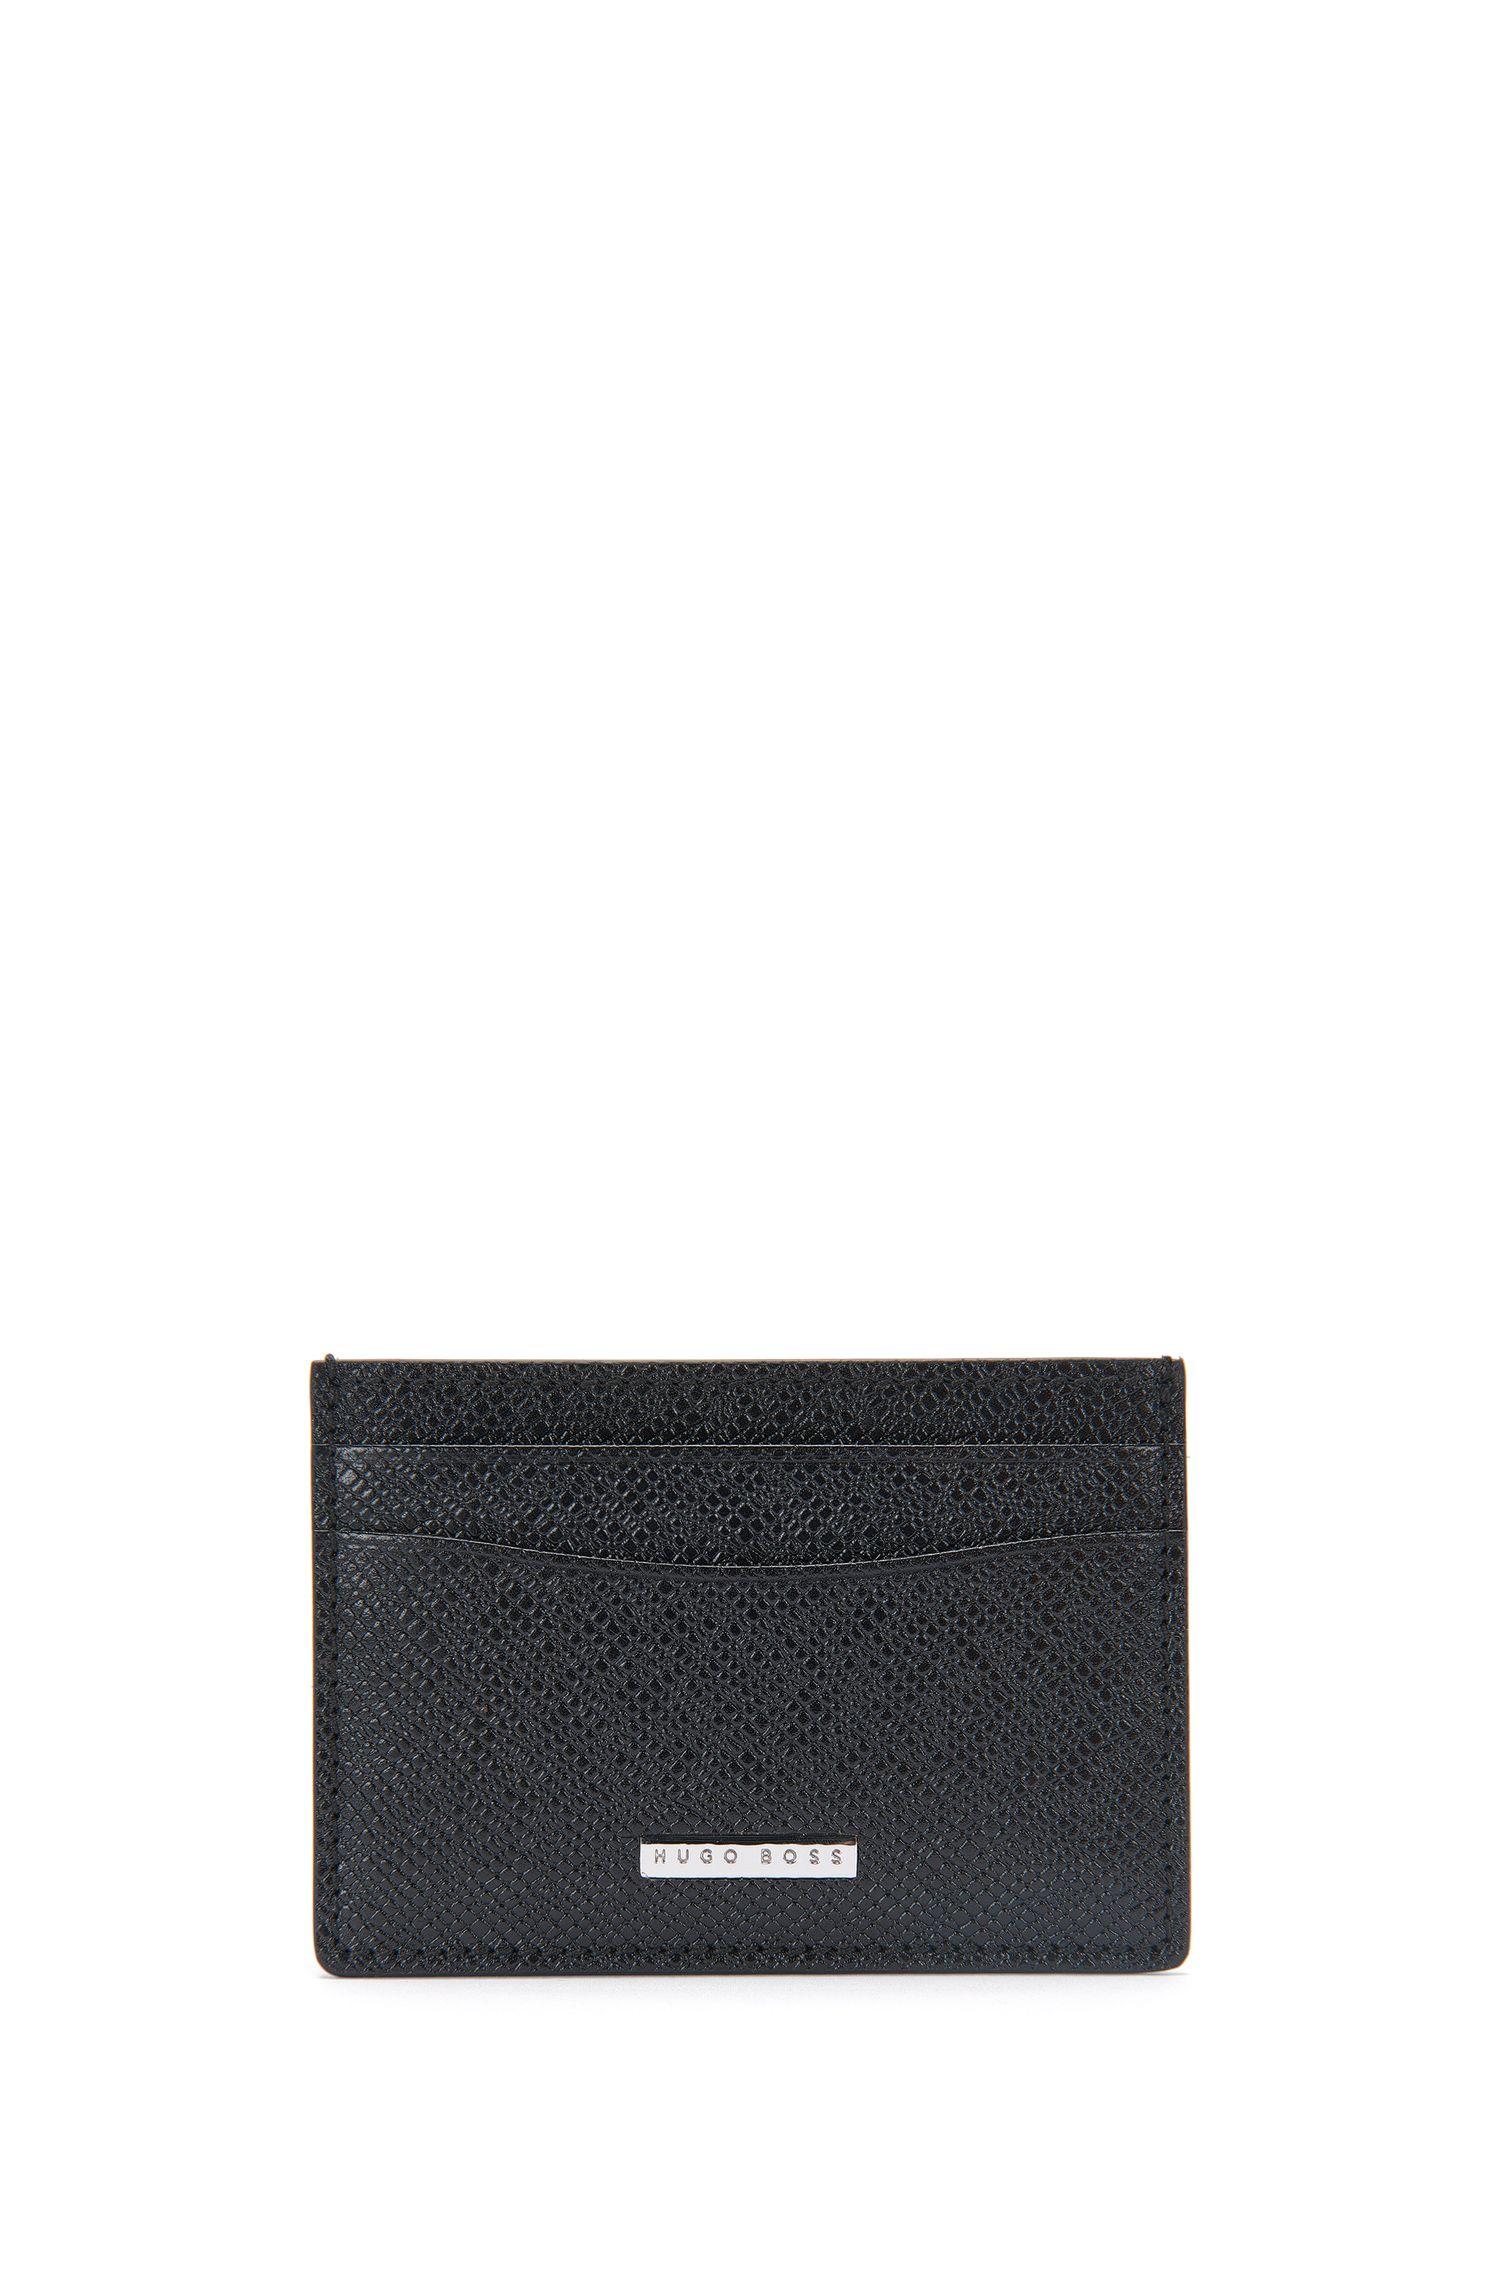 'Signature CC Window' | Calfskin Card Case with ID Window